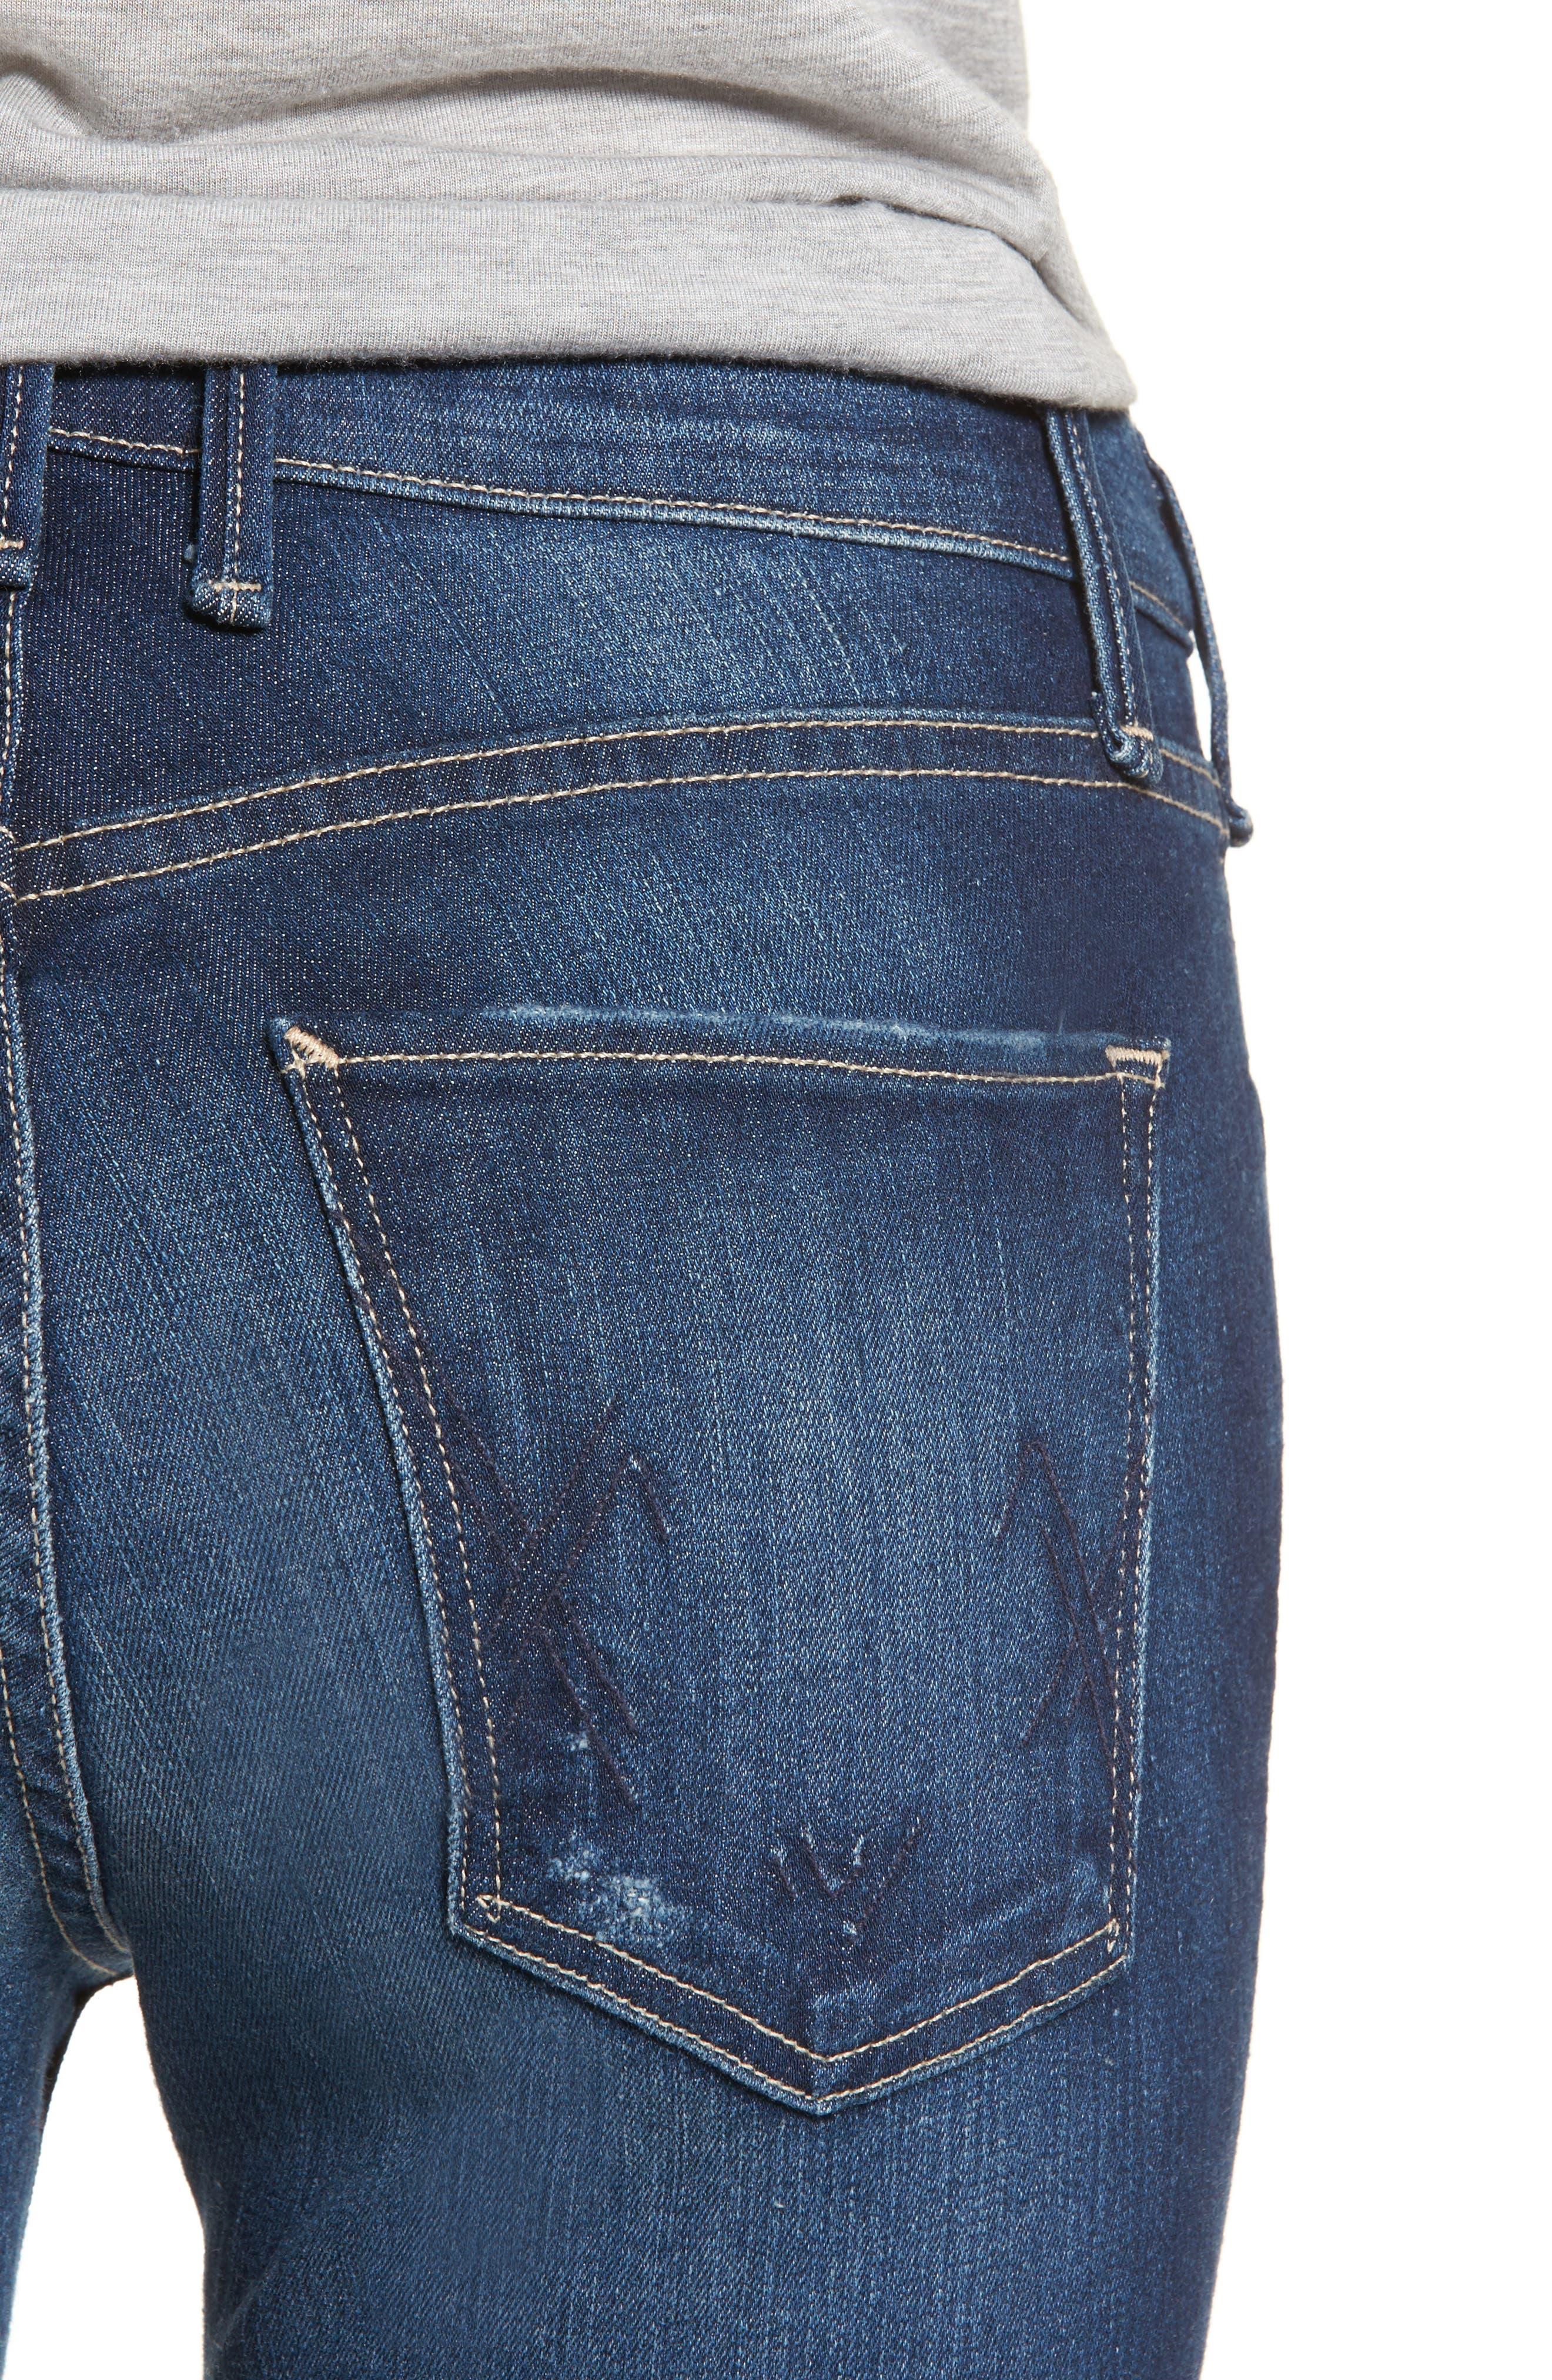 Newton Skinny Jeans,                             Alternate thumbnail 4, color,                             429